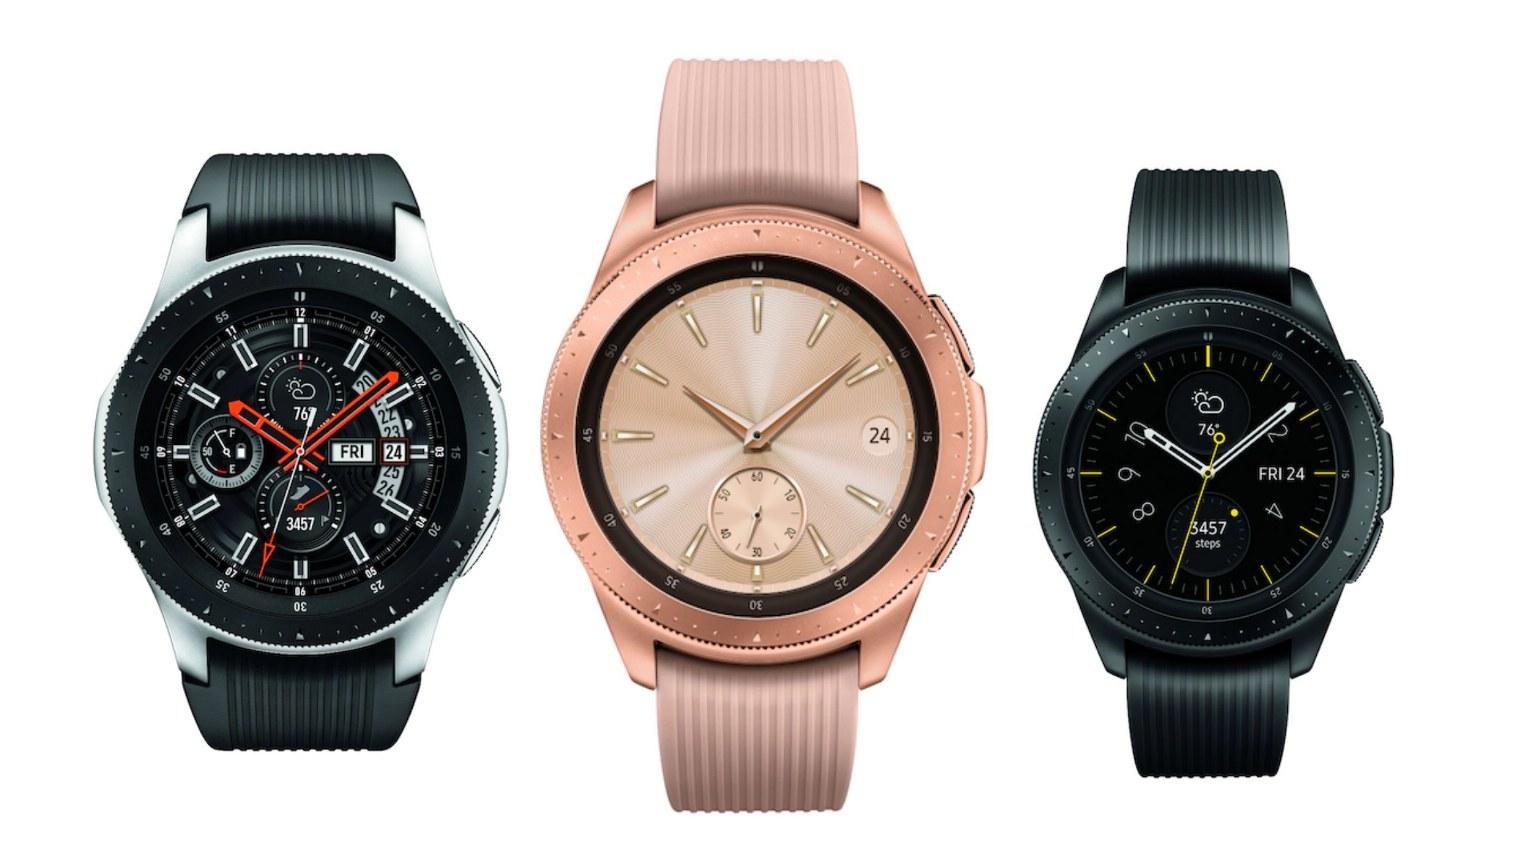 Samsung Galazy Watch